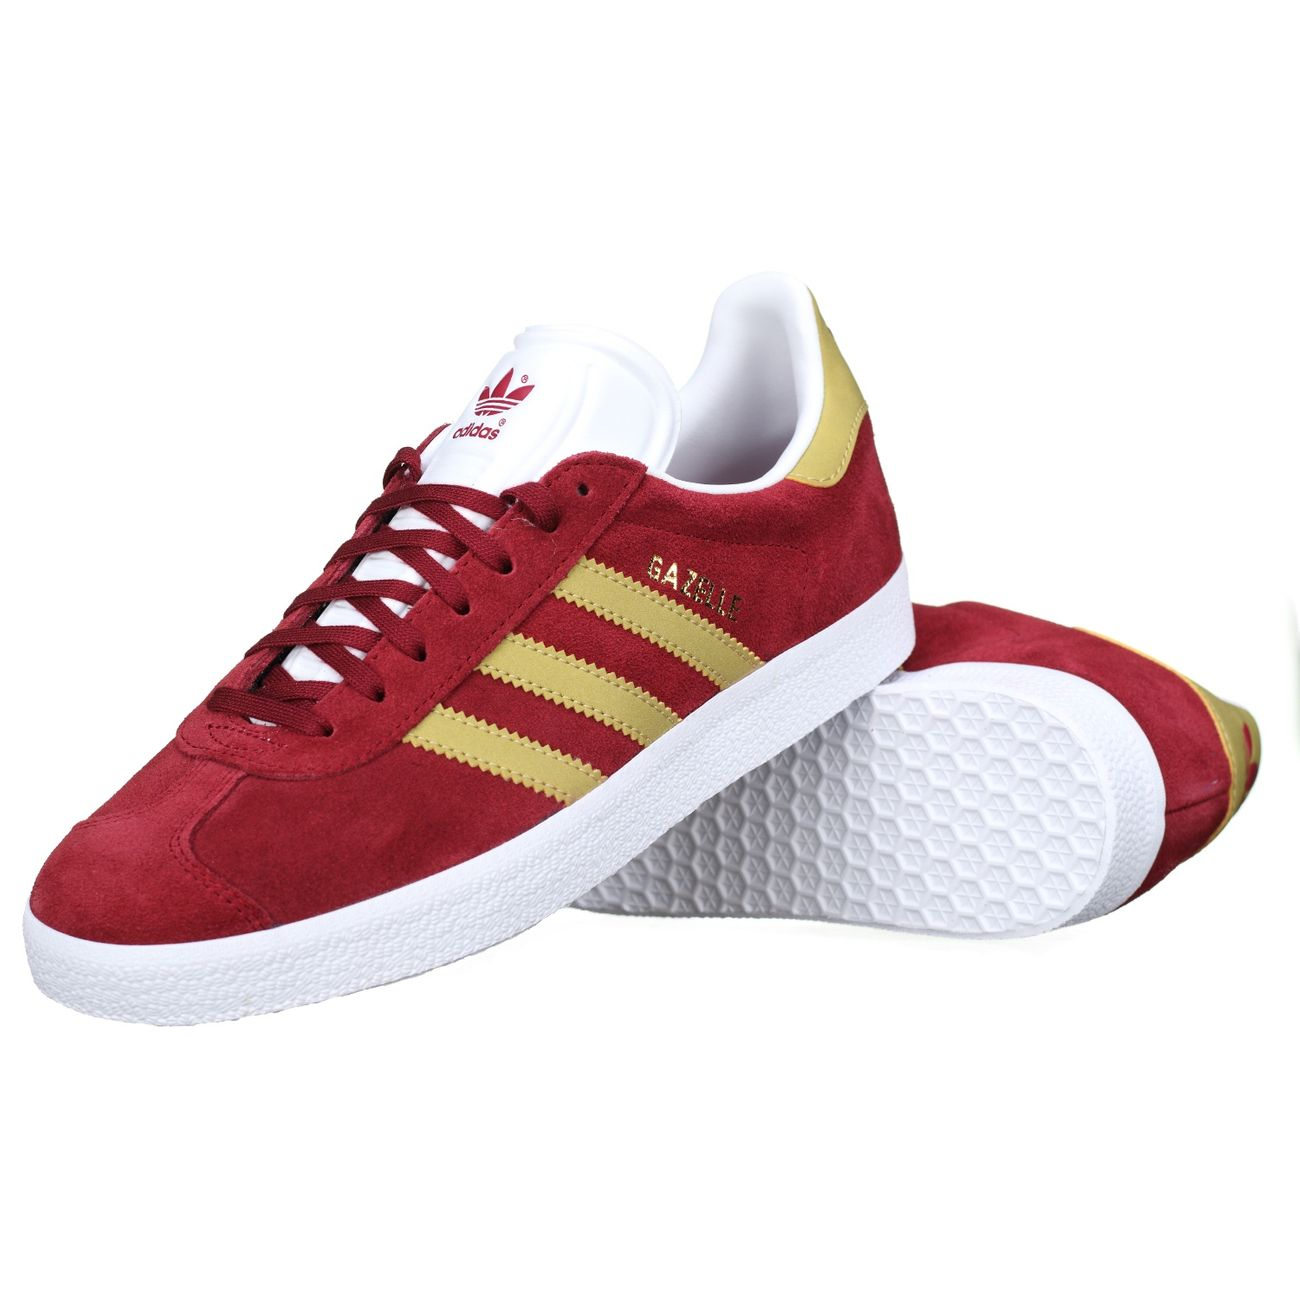 adidas gazelle homme go sport